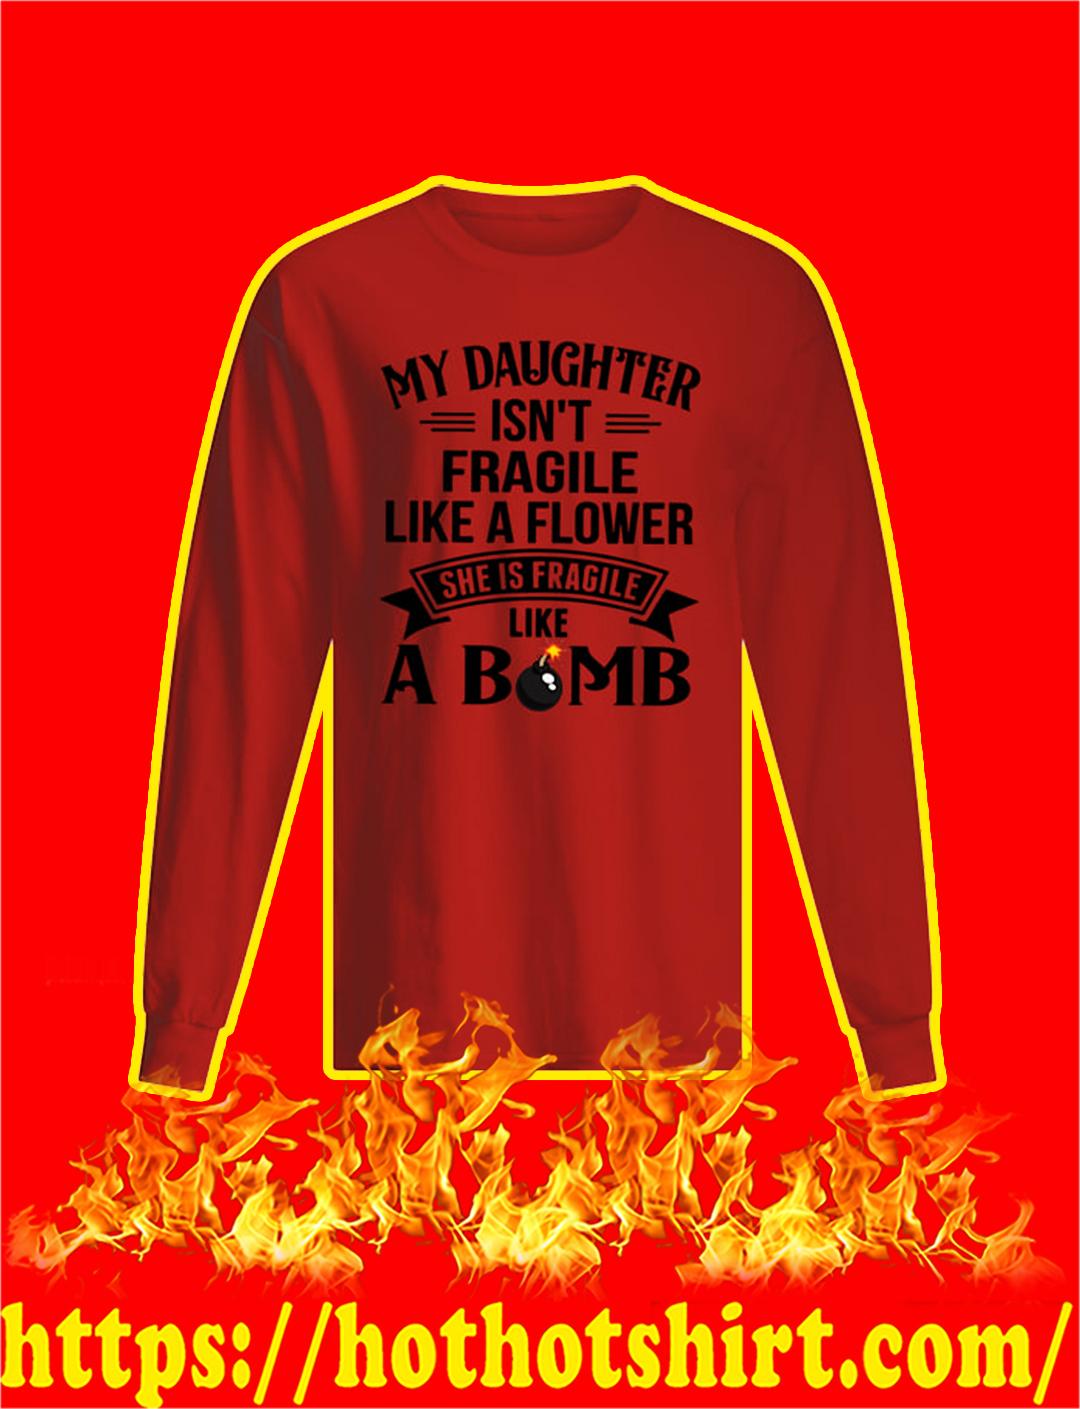 My Daughter Isn't Fragile Like A Flower She Is Fragile Like A Bomb sweatshirt